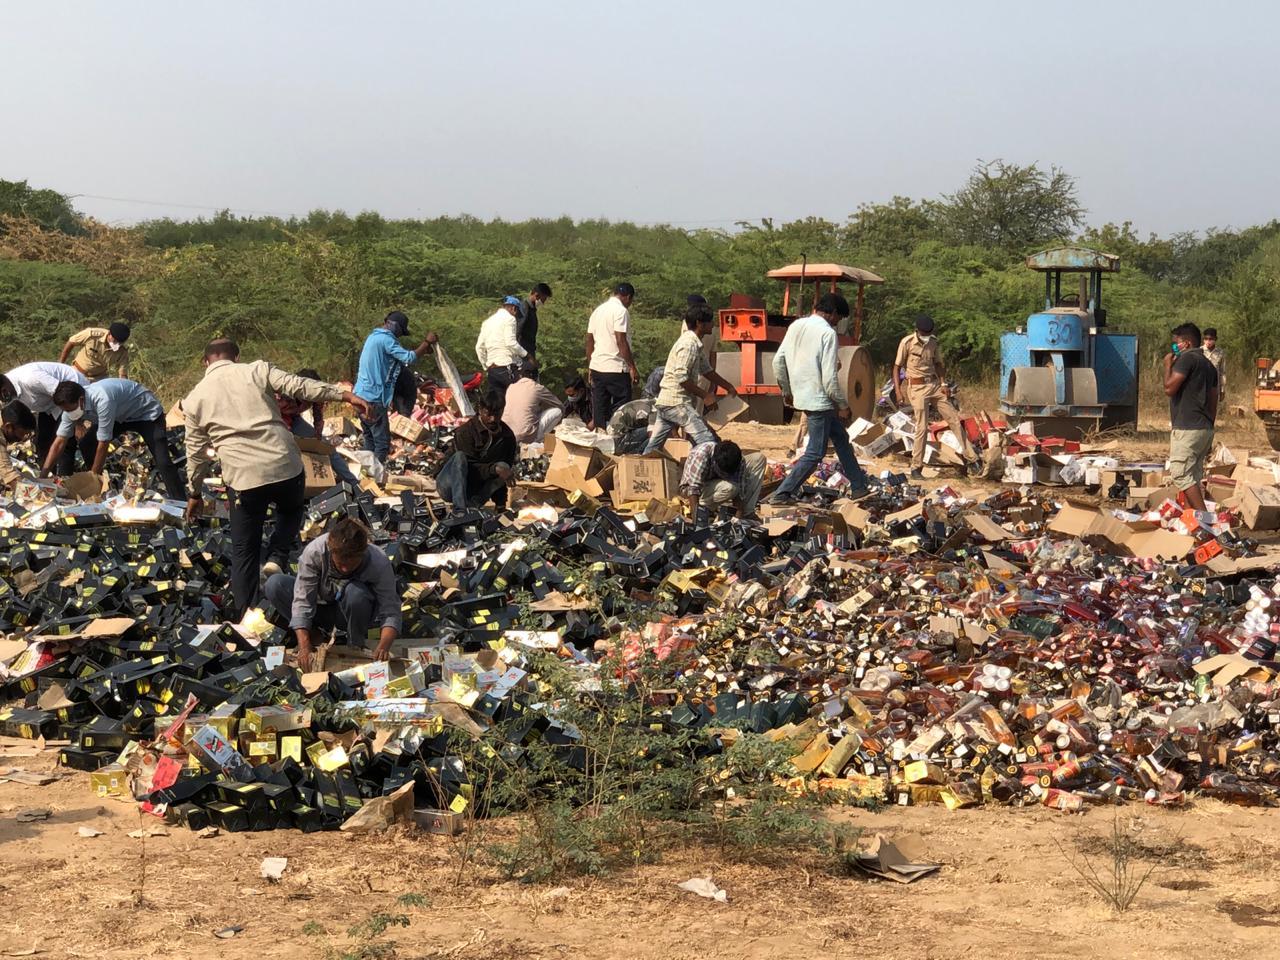 Liquor worth 87.65 lakhs caught by Vadodara police destroyed at Chikodara village